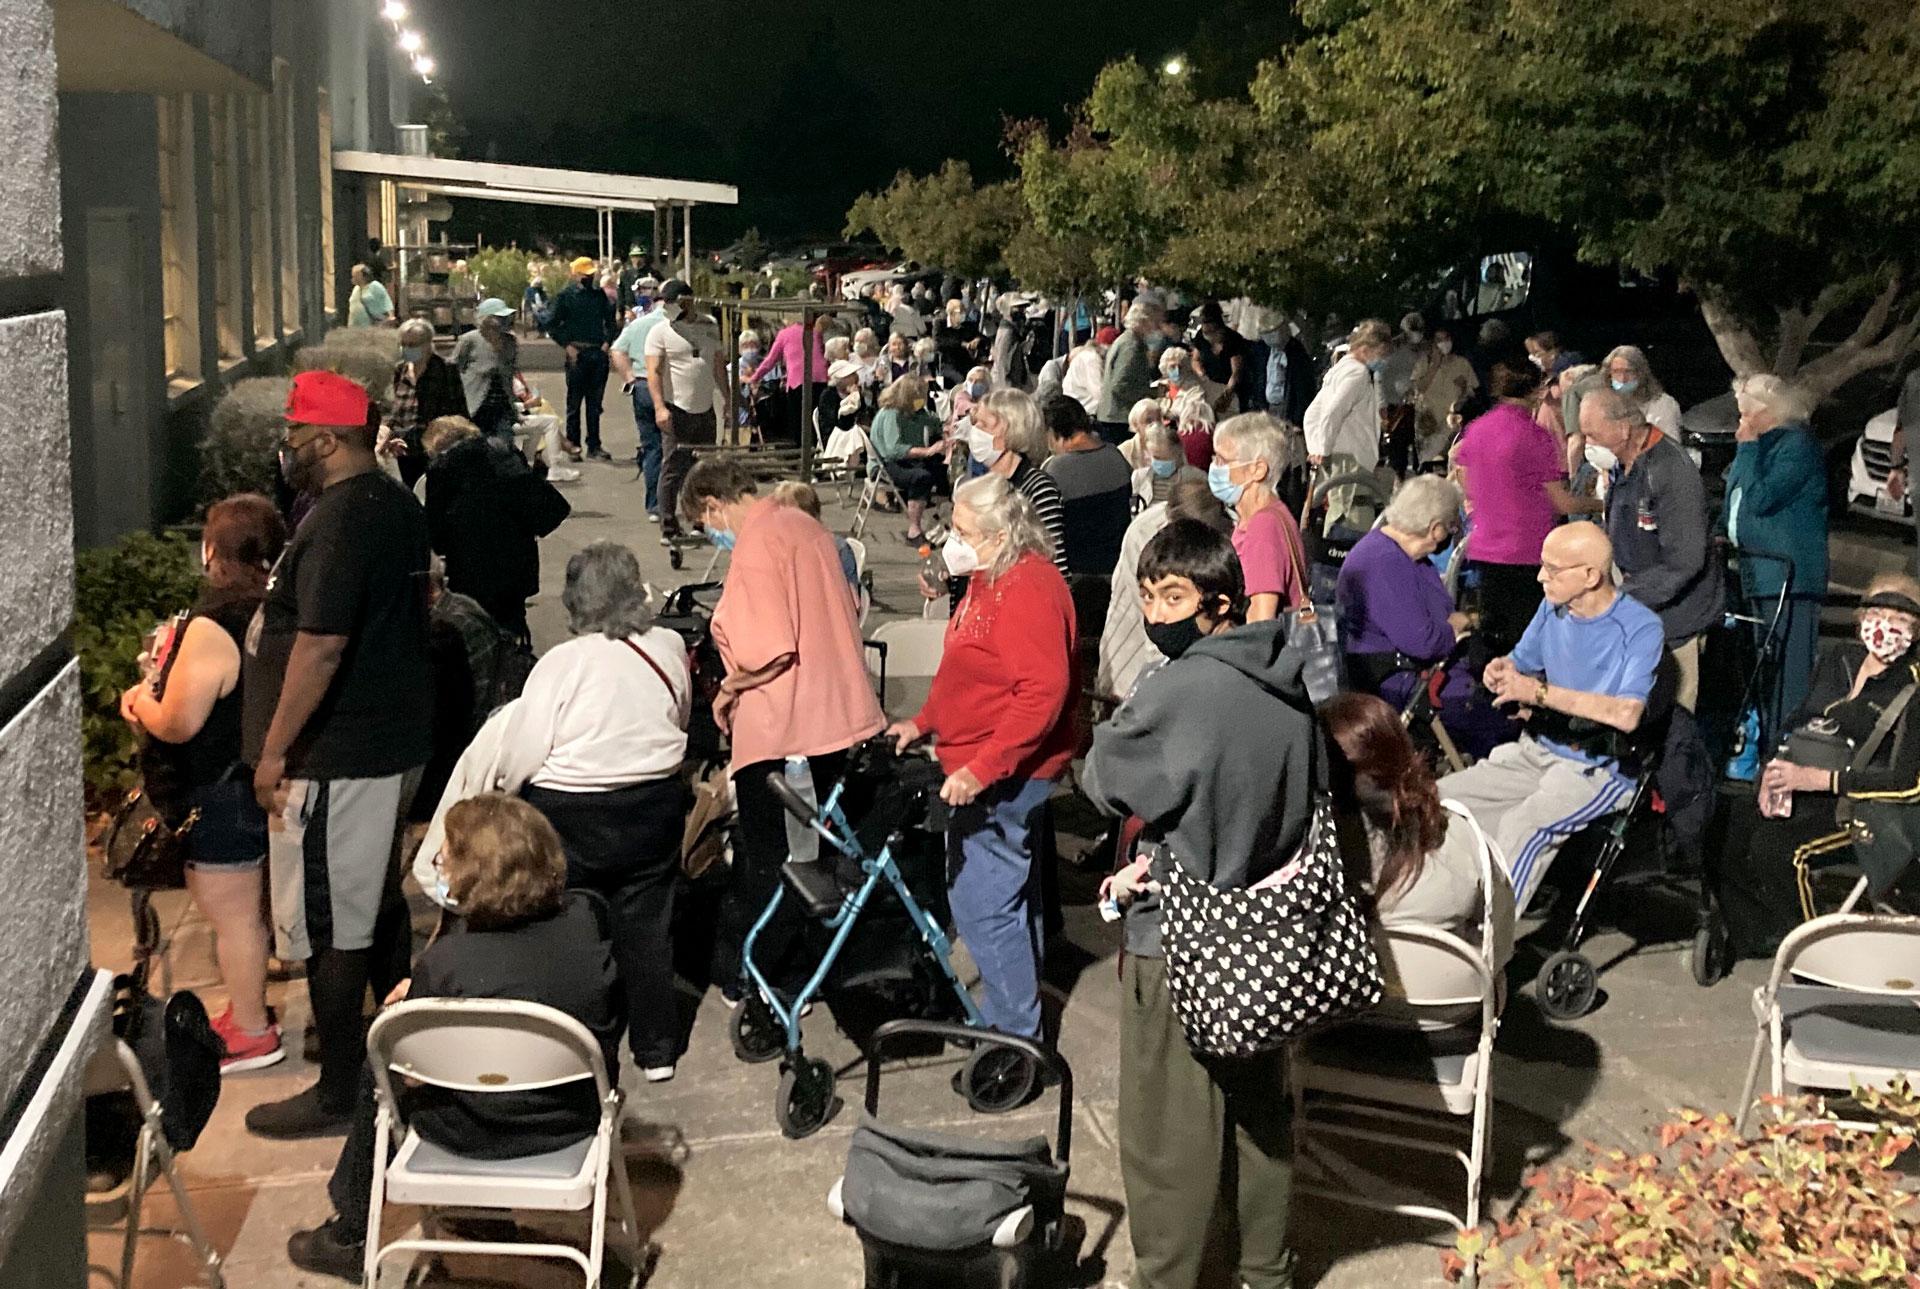 senior evacuees wait outside